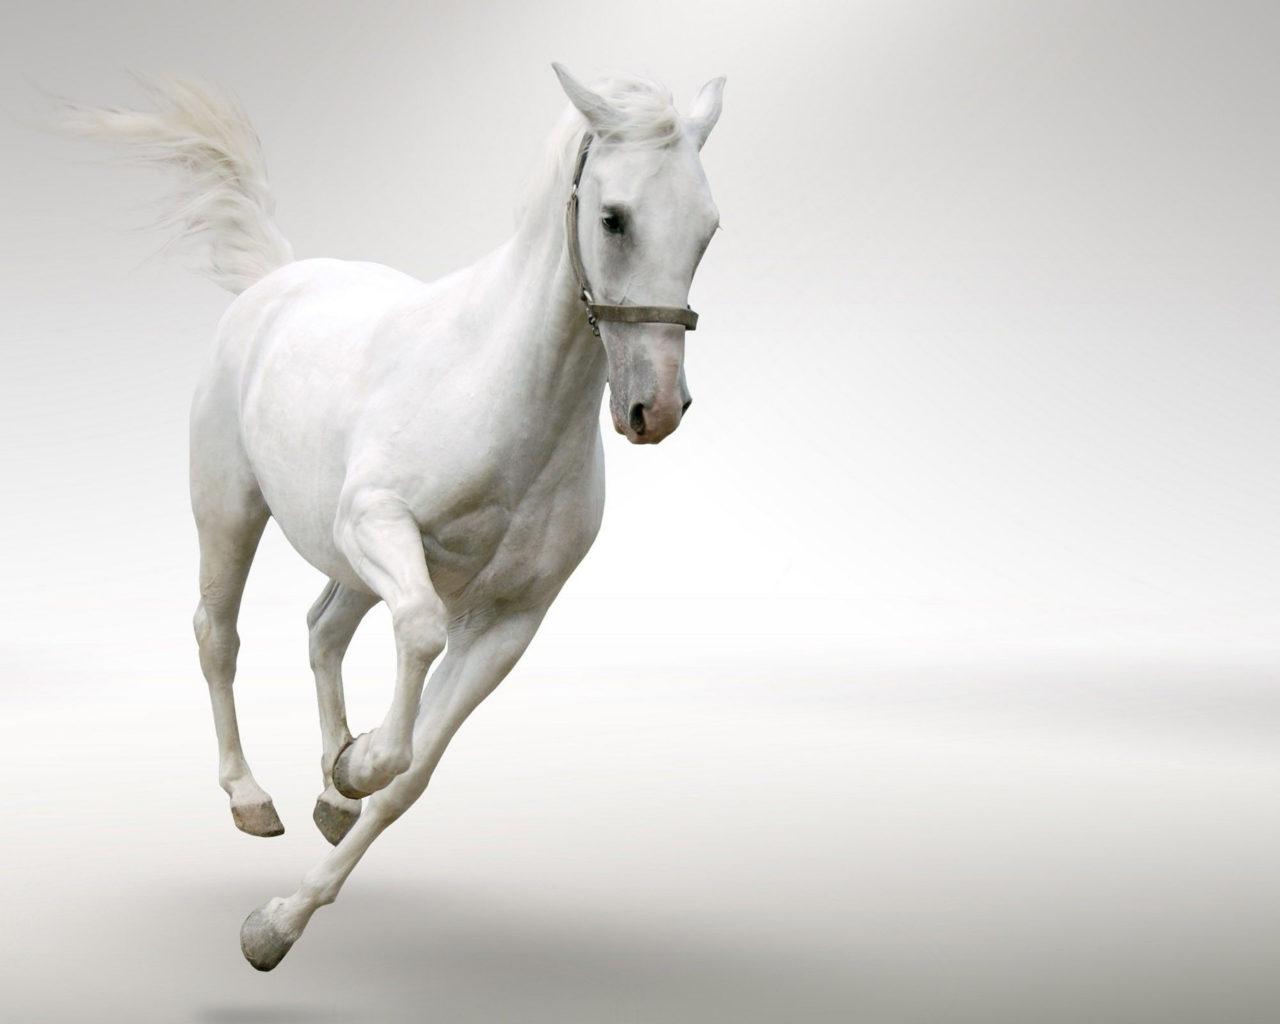 Cute Christmas Penguin Wallpaper White Horse Running Desktop Wallpaper Hd Wallpapers13 Com